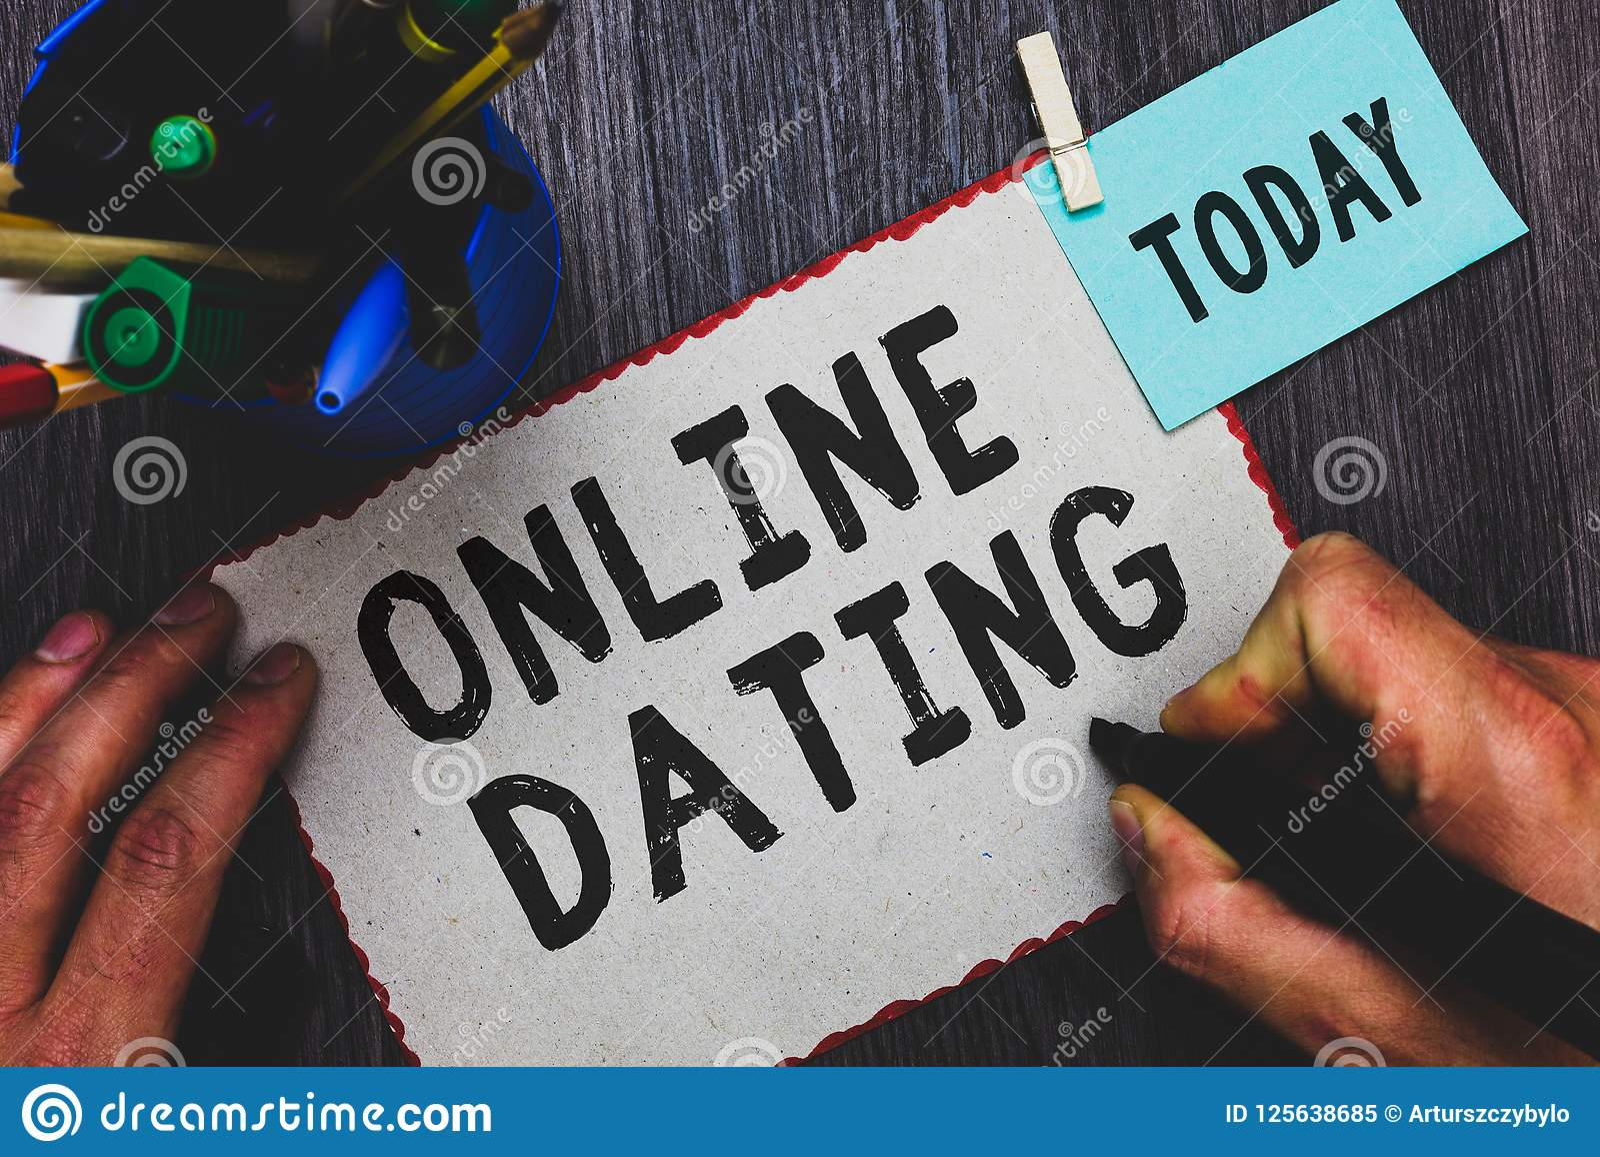 Dating I Jokkmokk, Hol dating sweden, Dejta i sturefors : Ekholmensallservice